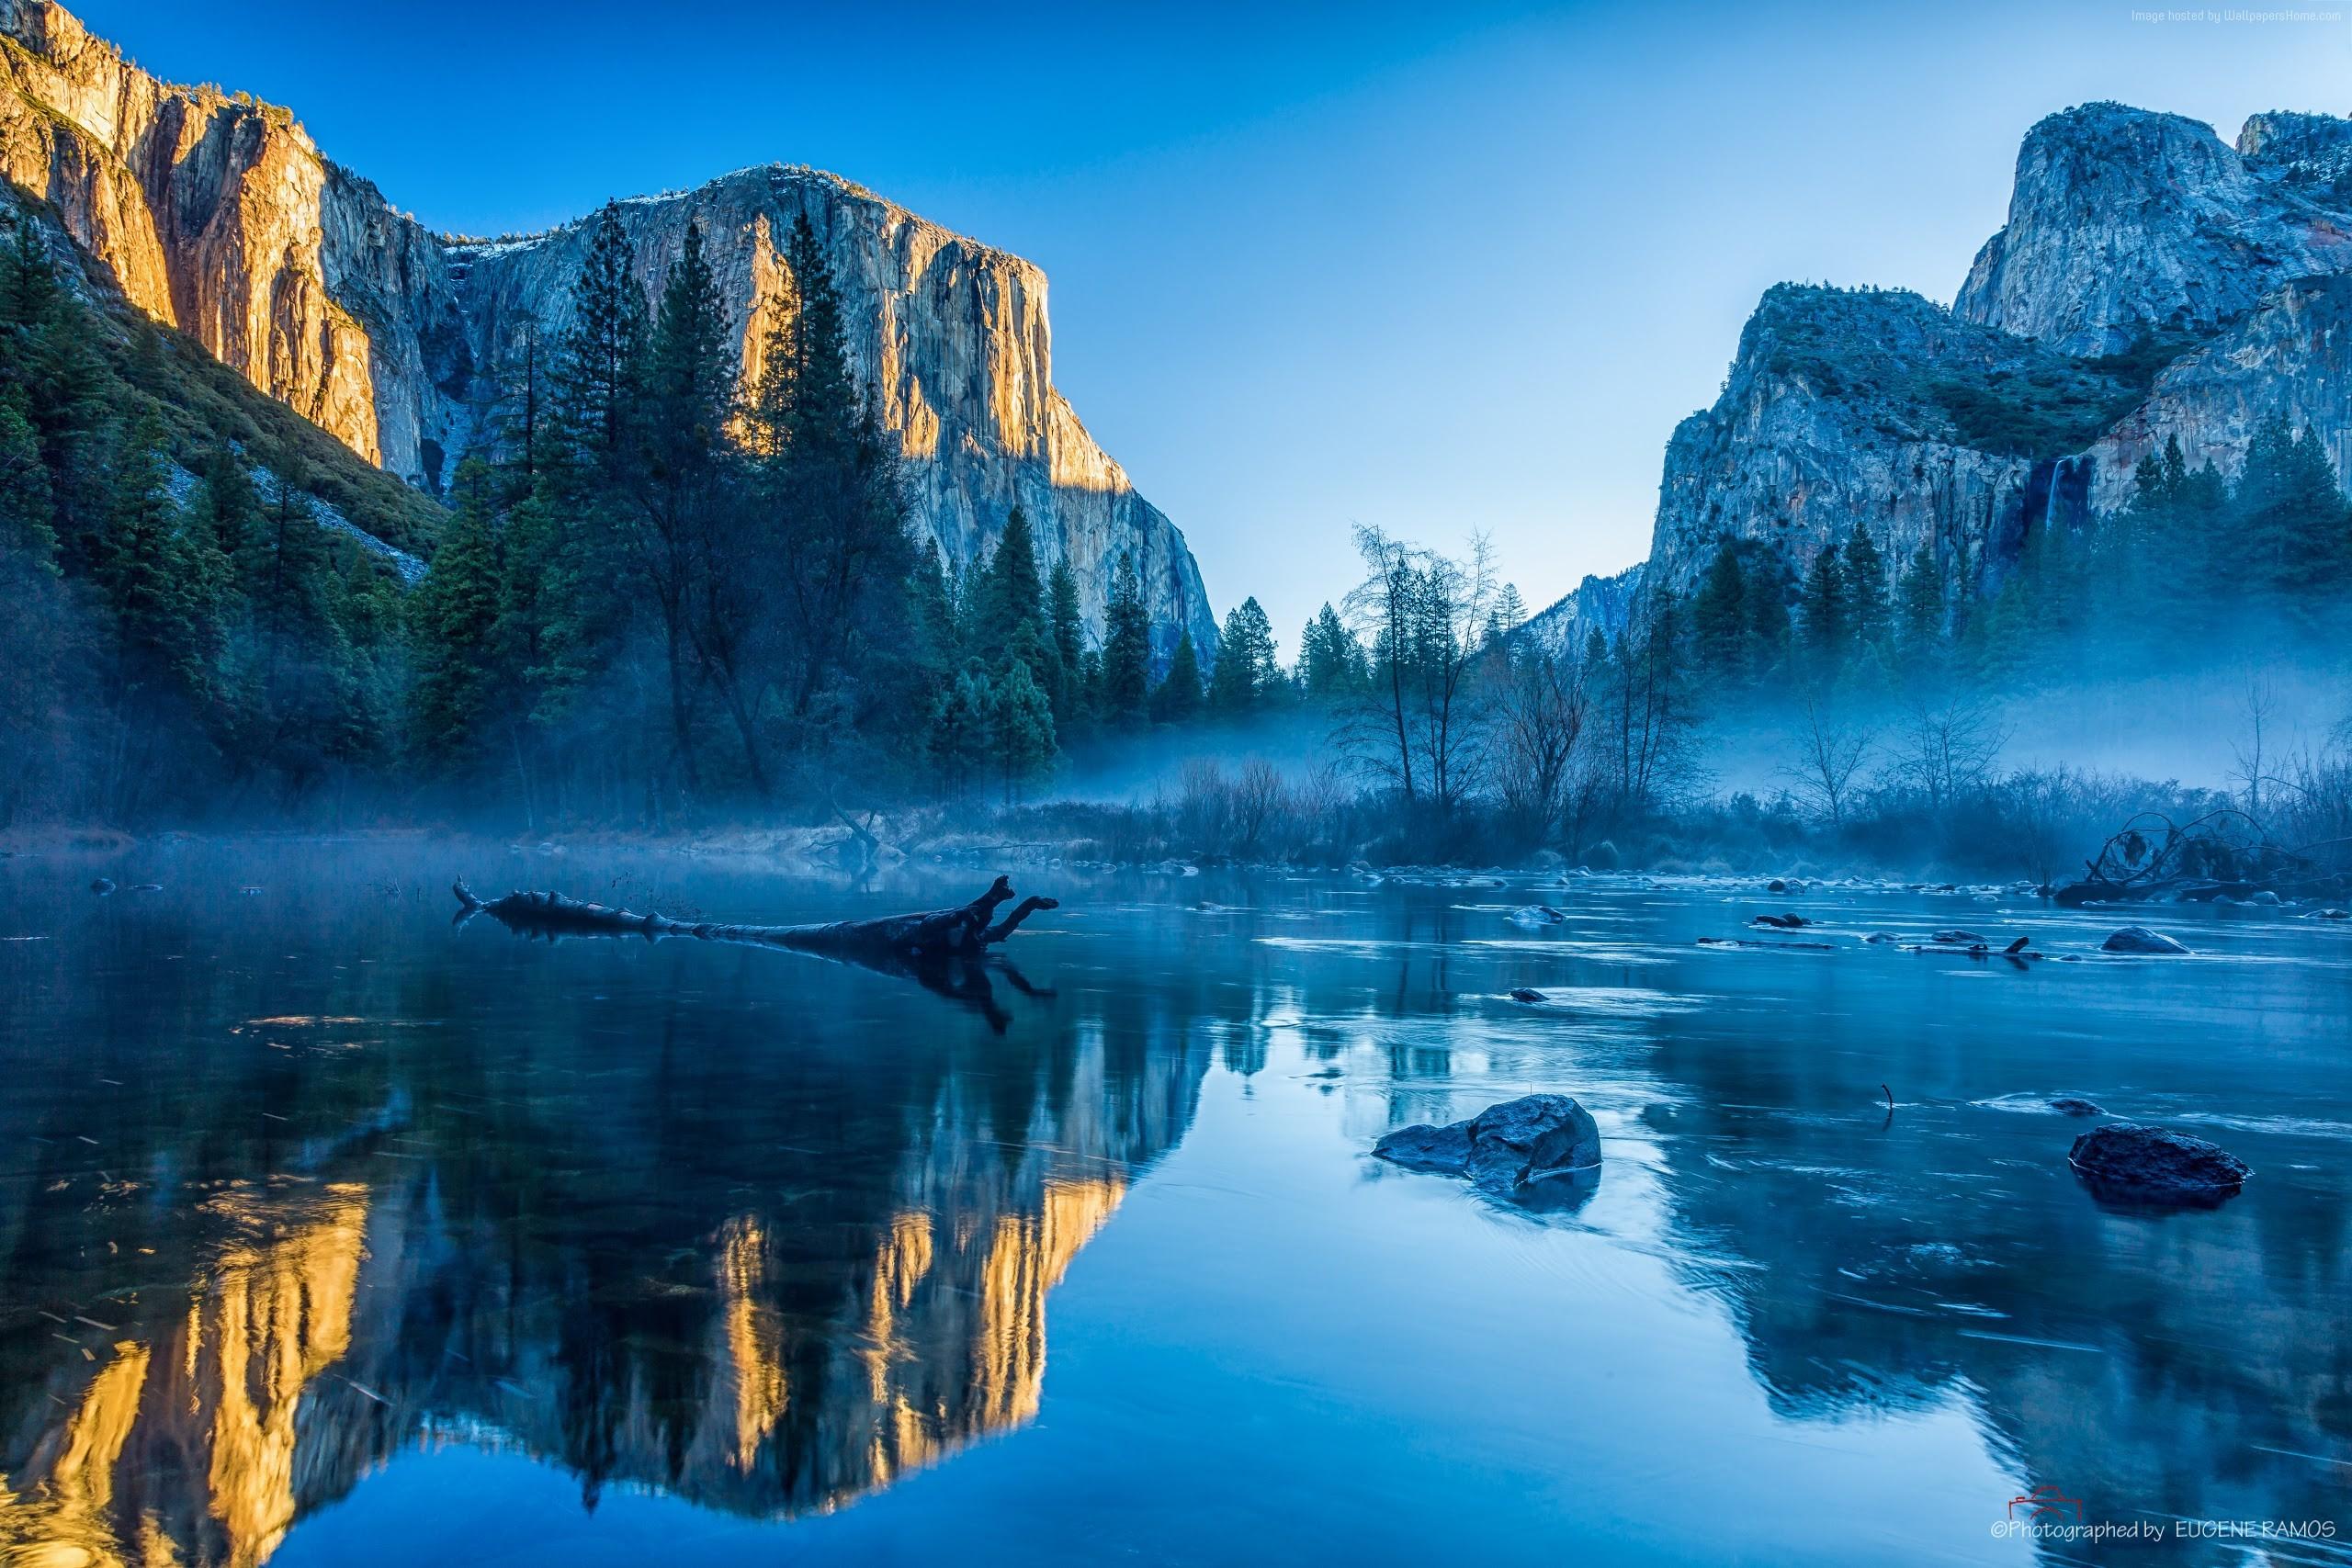 Top Wallpaper Macbook Yosemite - yosemite-captain-apple-original-sd  Collection_885157.jpg